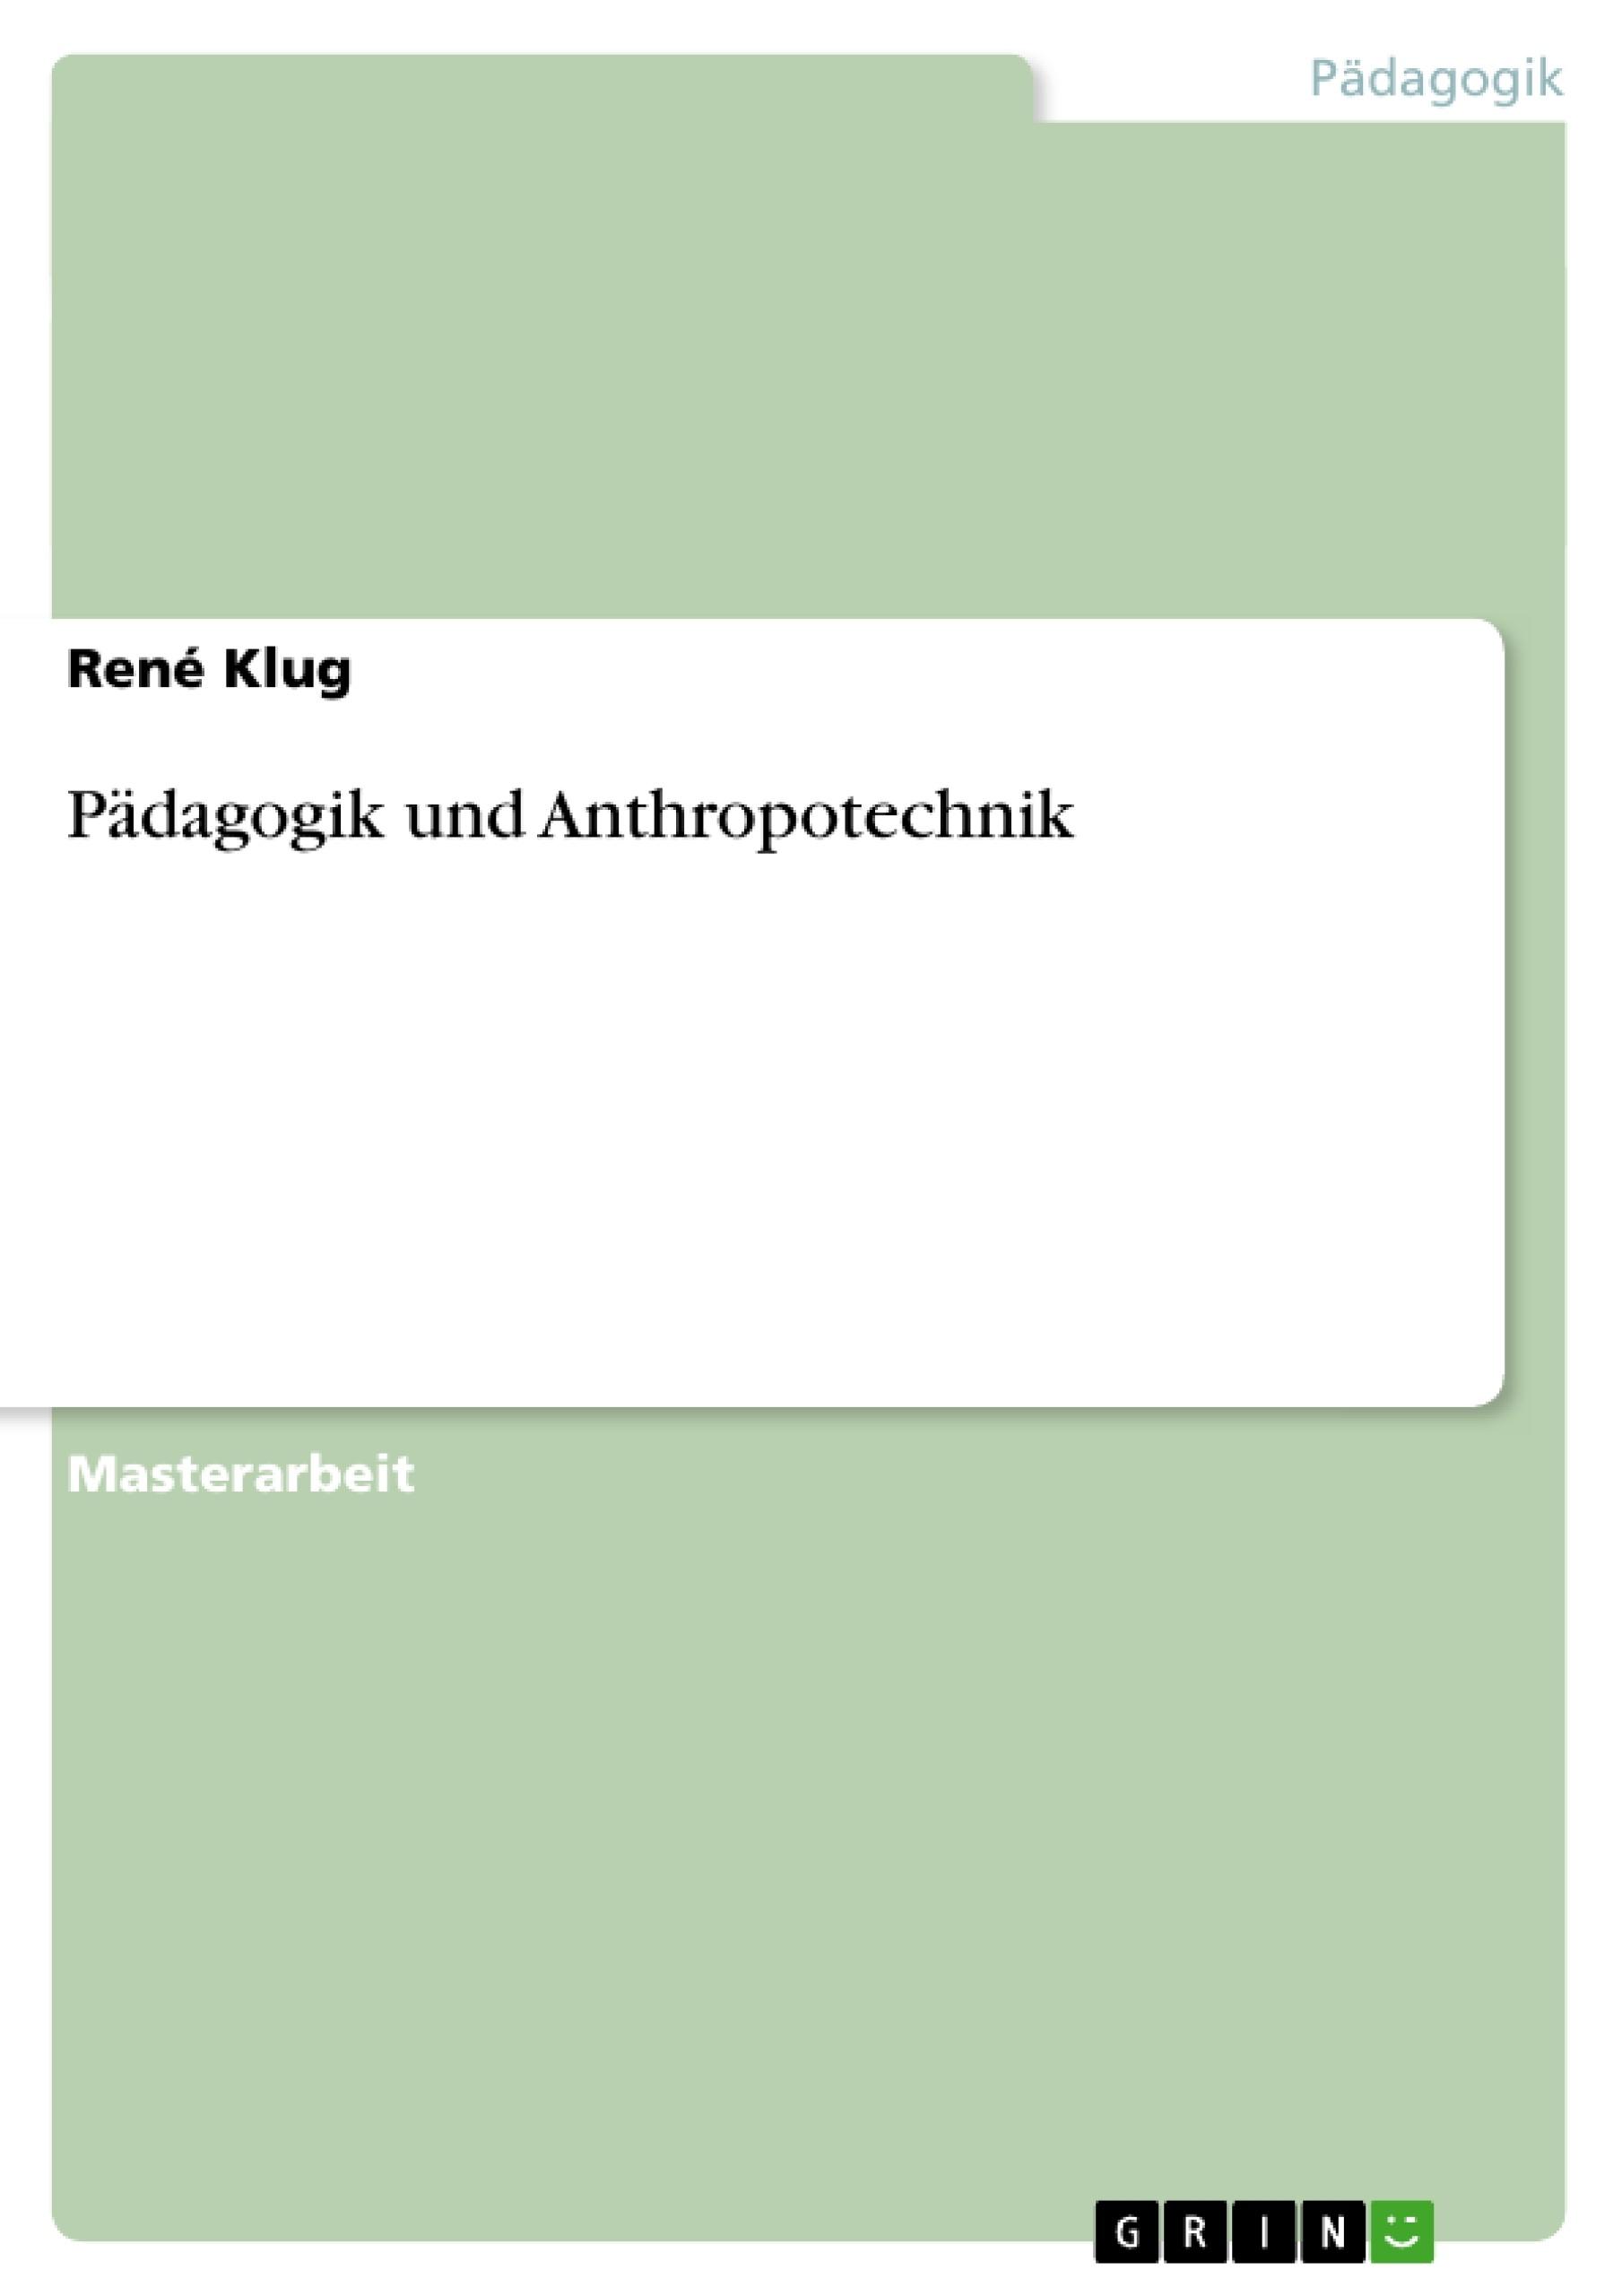 Titel: Pädagogik und Anthropotechnik